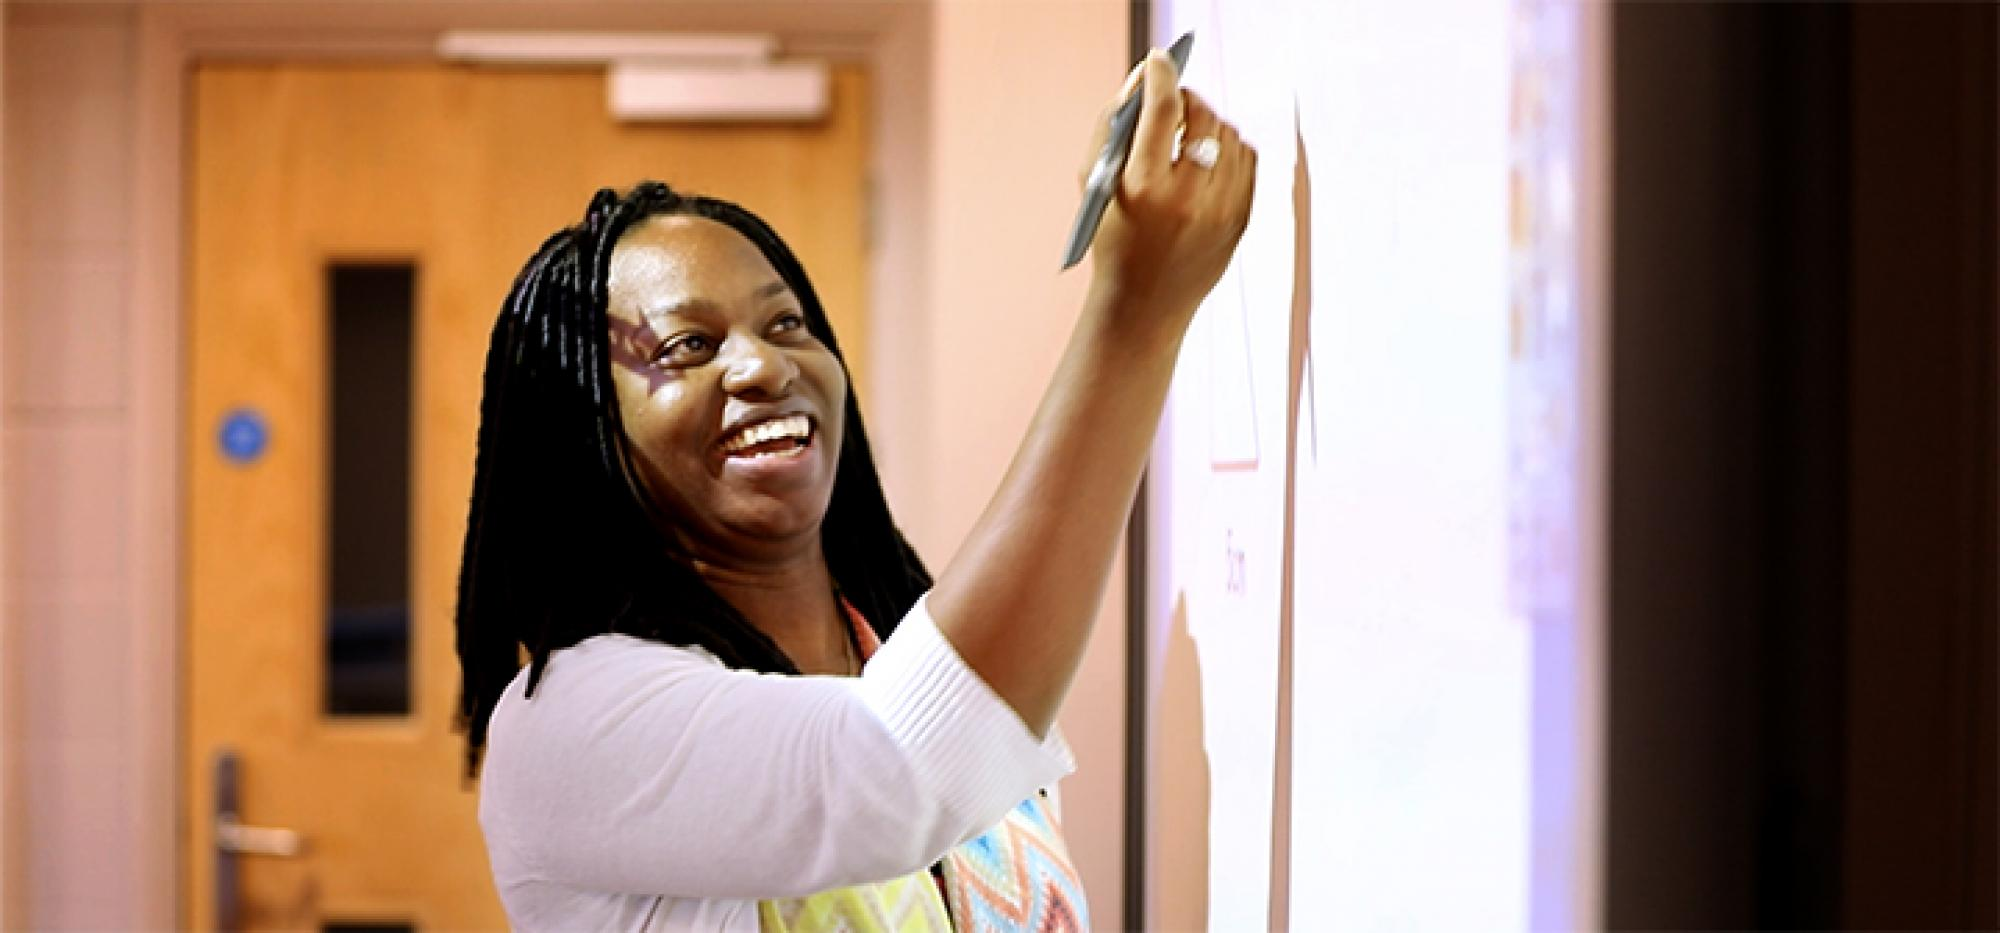 Kaydi-Ann Newsome writes at a marker board